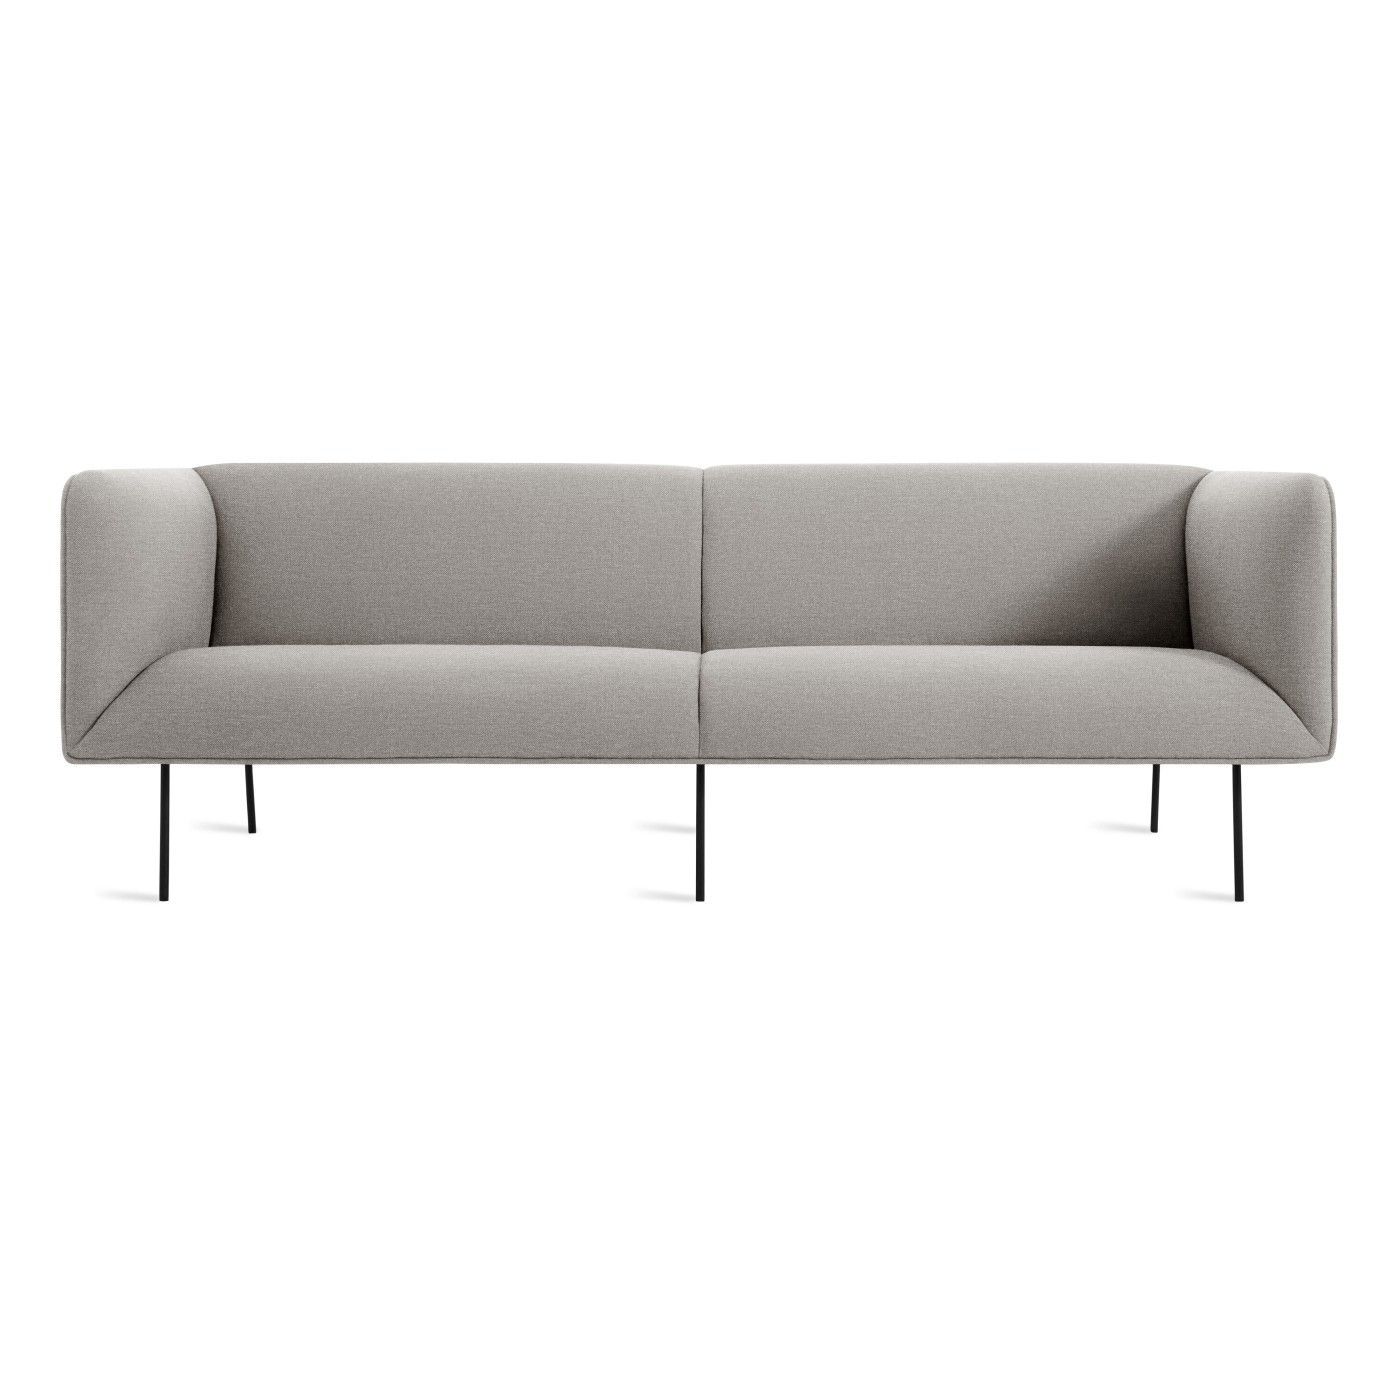 Dandy 96 Quot Sofa Modern Furniture Modern Sleeper Sofa